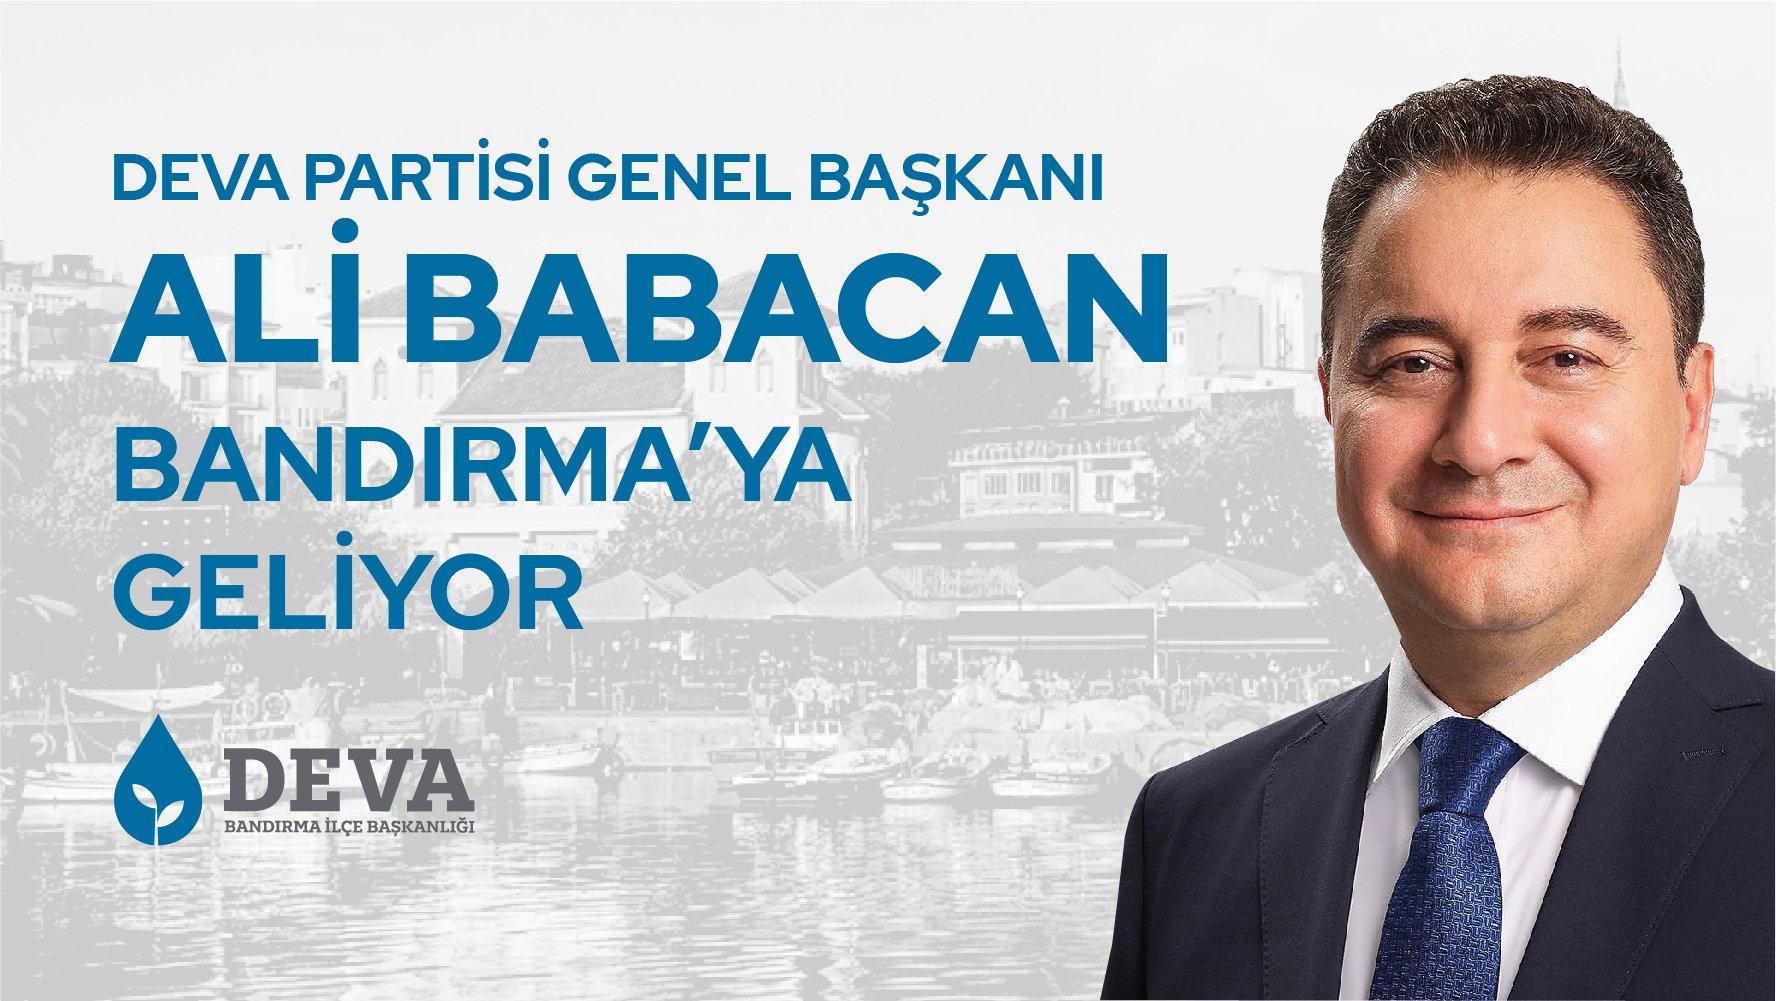 Ali Babacan Bandırma'ya Geliyor